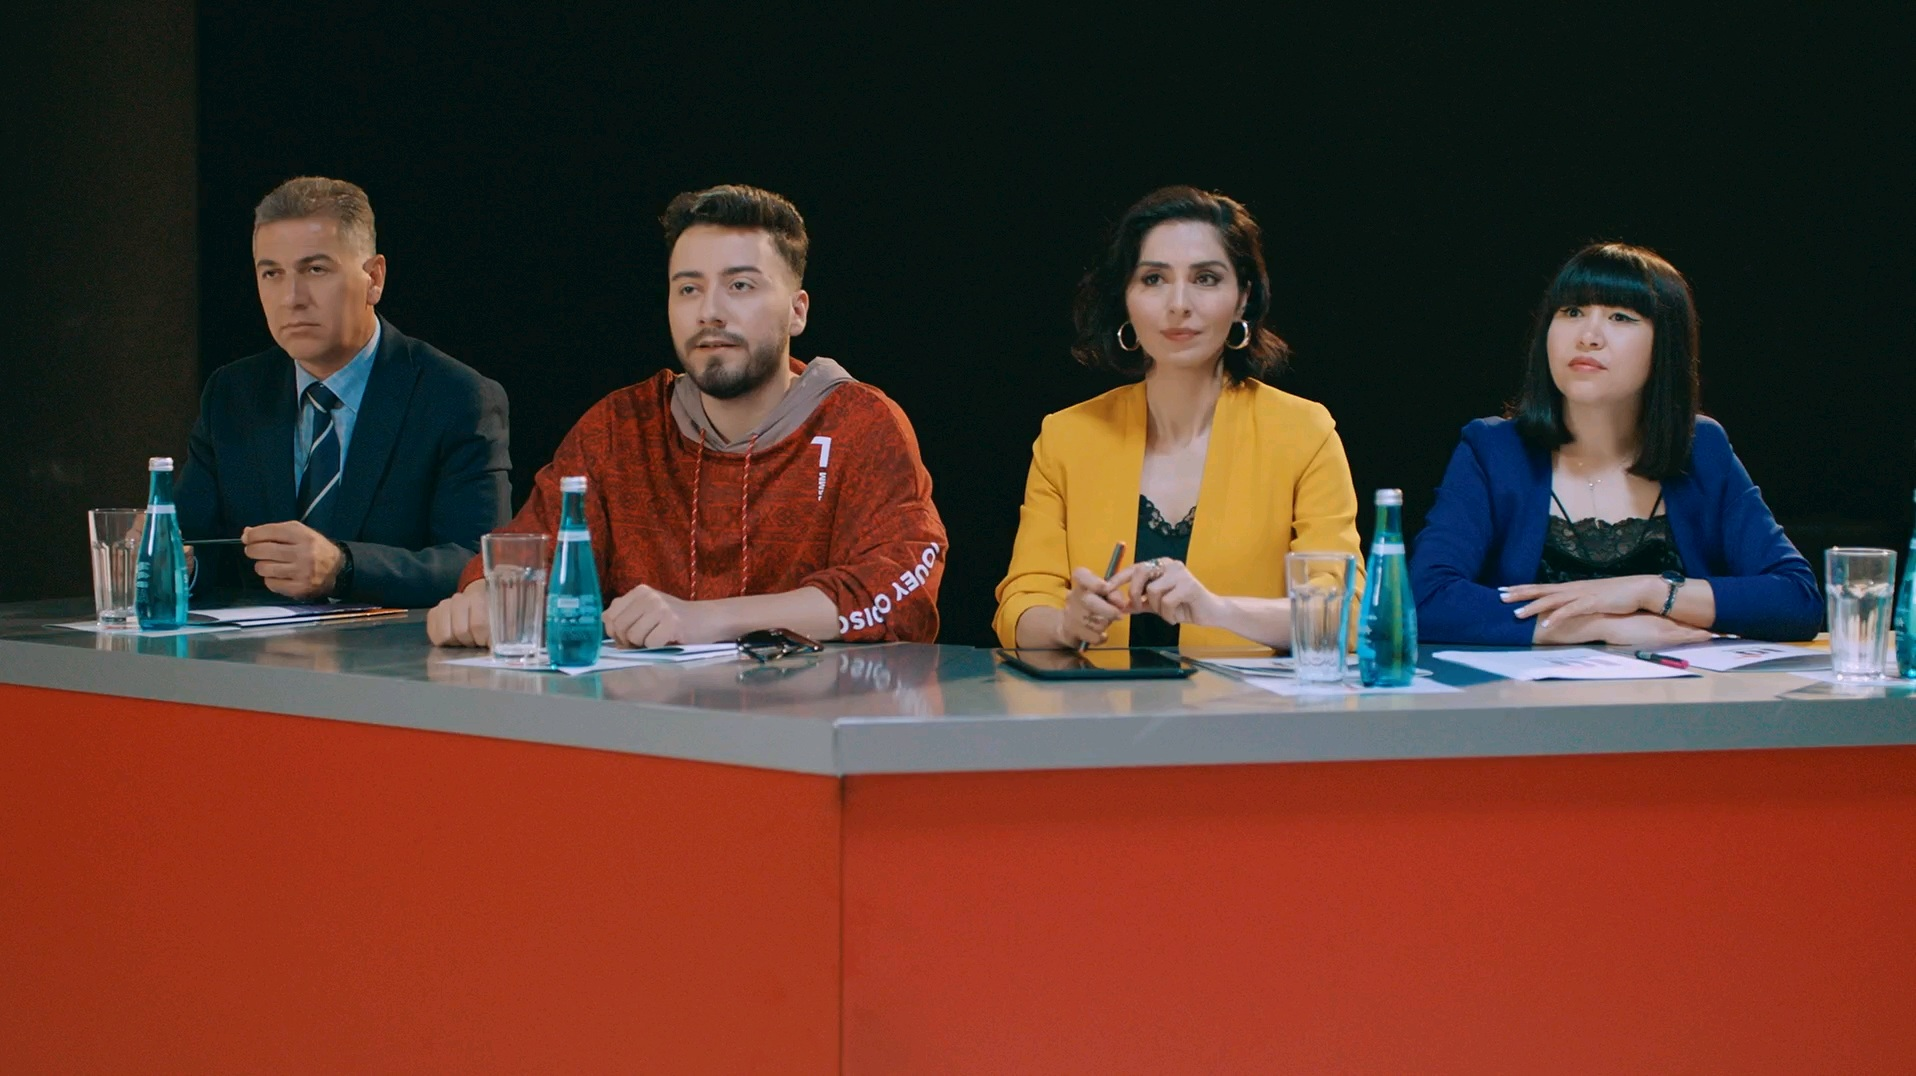 Enes Batur: Gerçek Kahraman | 2019 | Yerli Film | NF | WEB-DL | XviD | Sansürsüz | 1080p - m720p - m1080p | WEB-DL | Tek Link